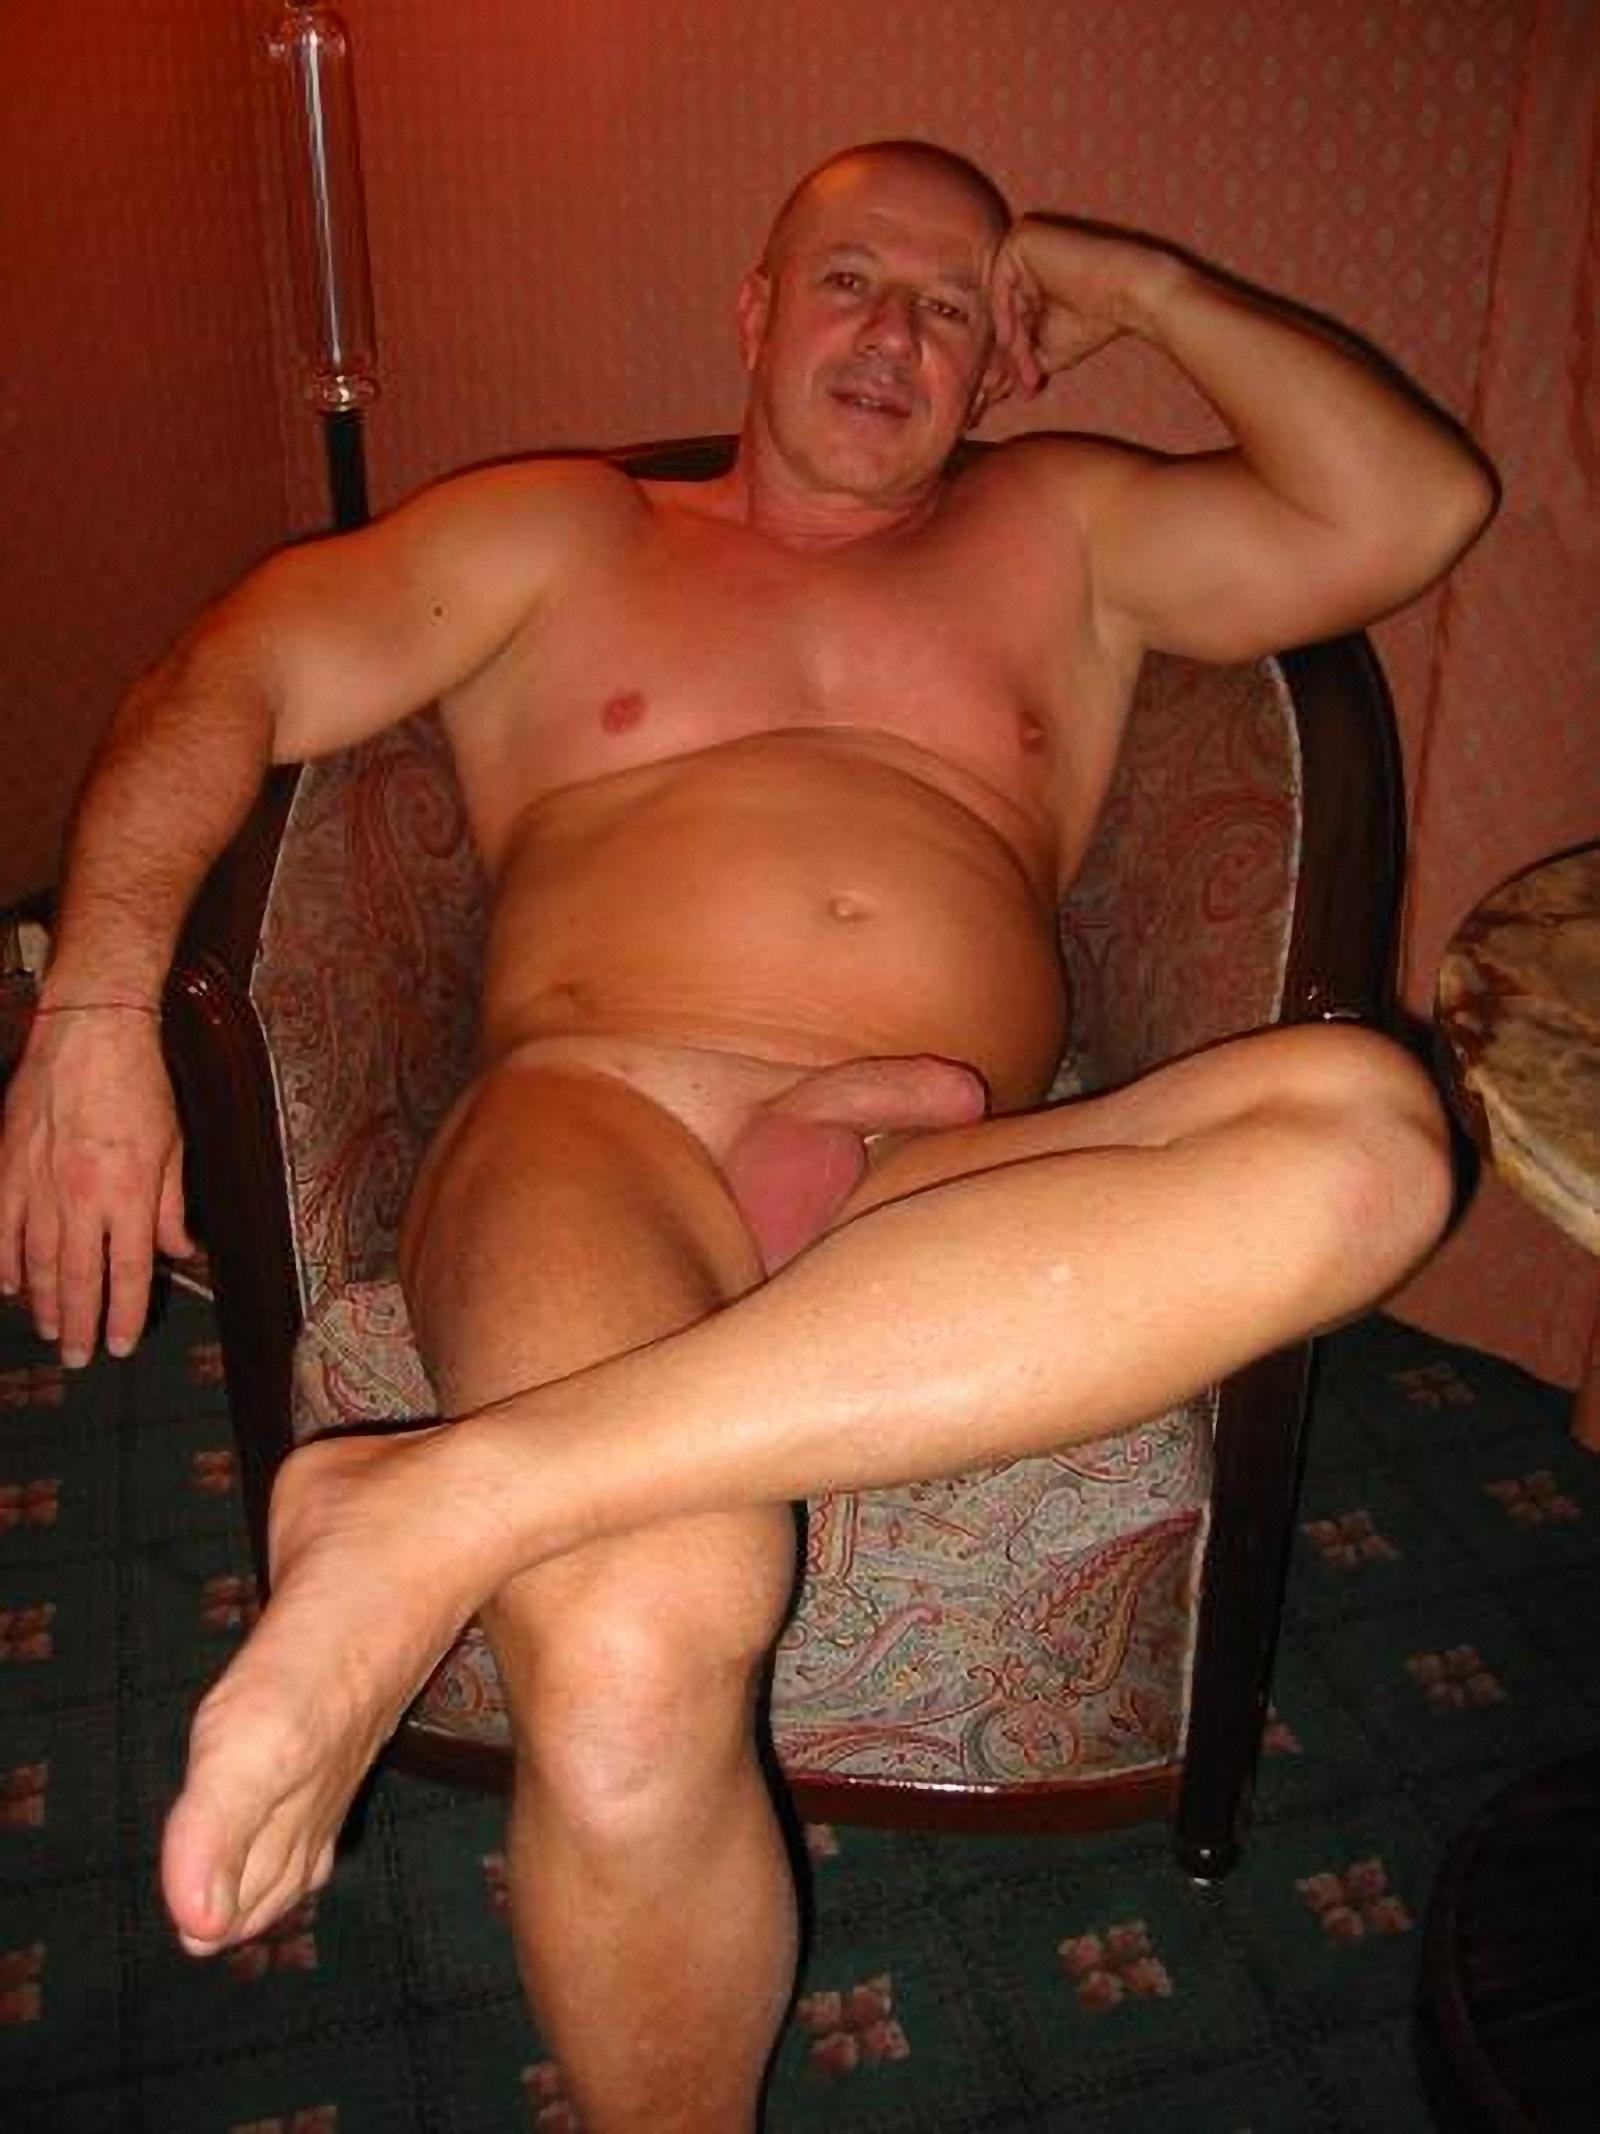 golie-vzroslie-parni